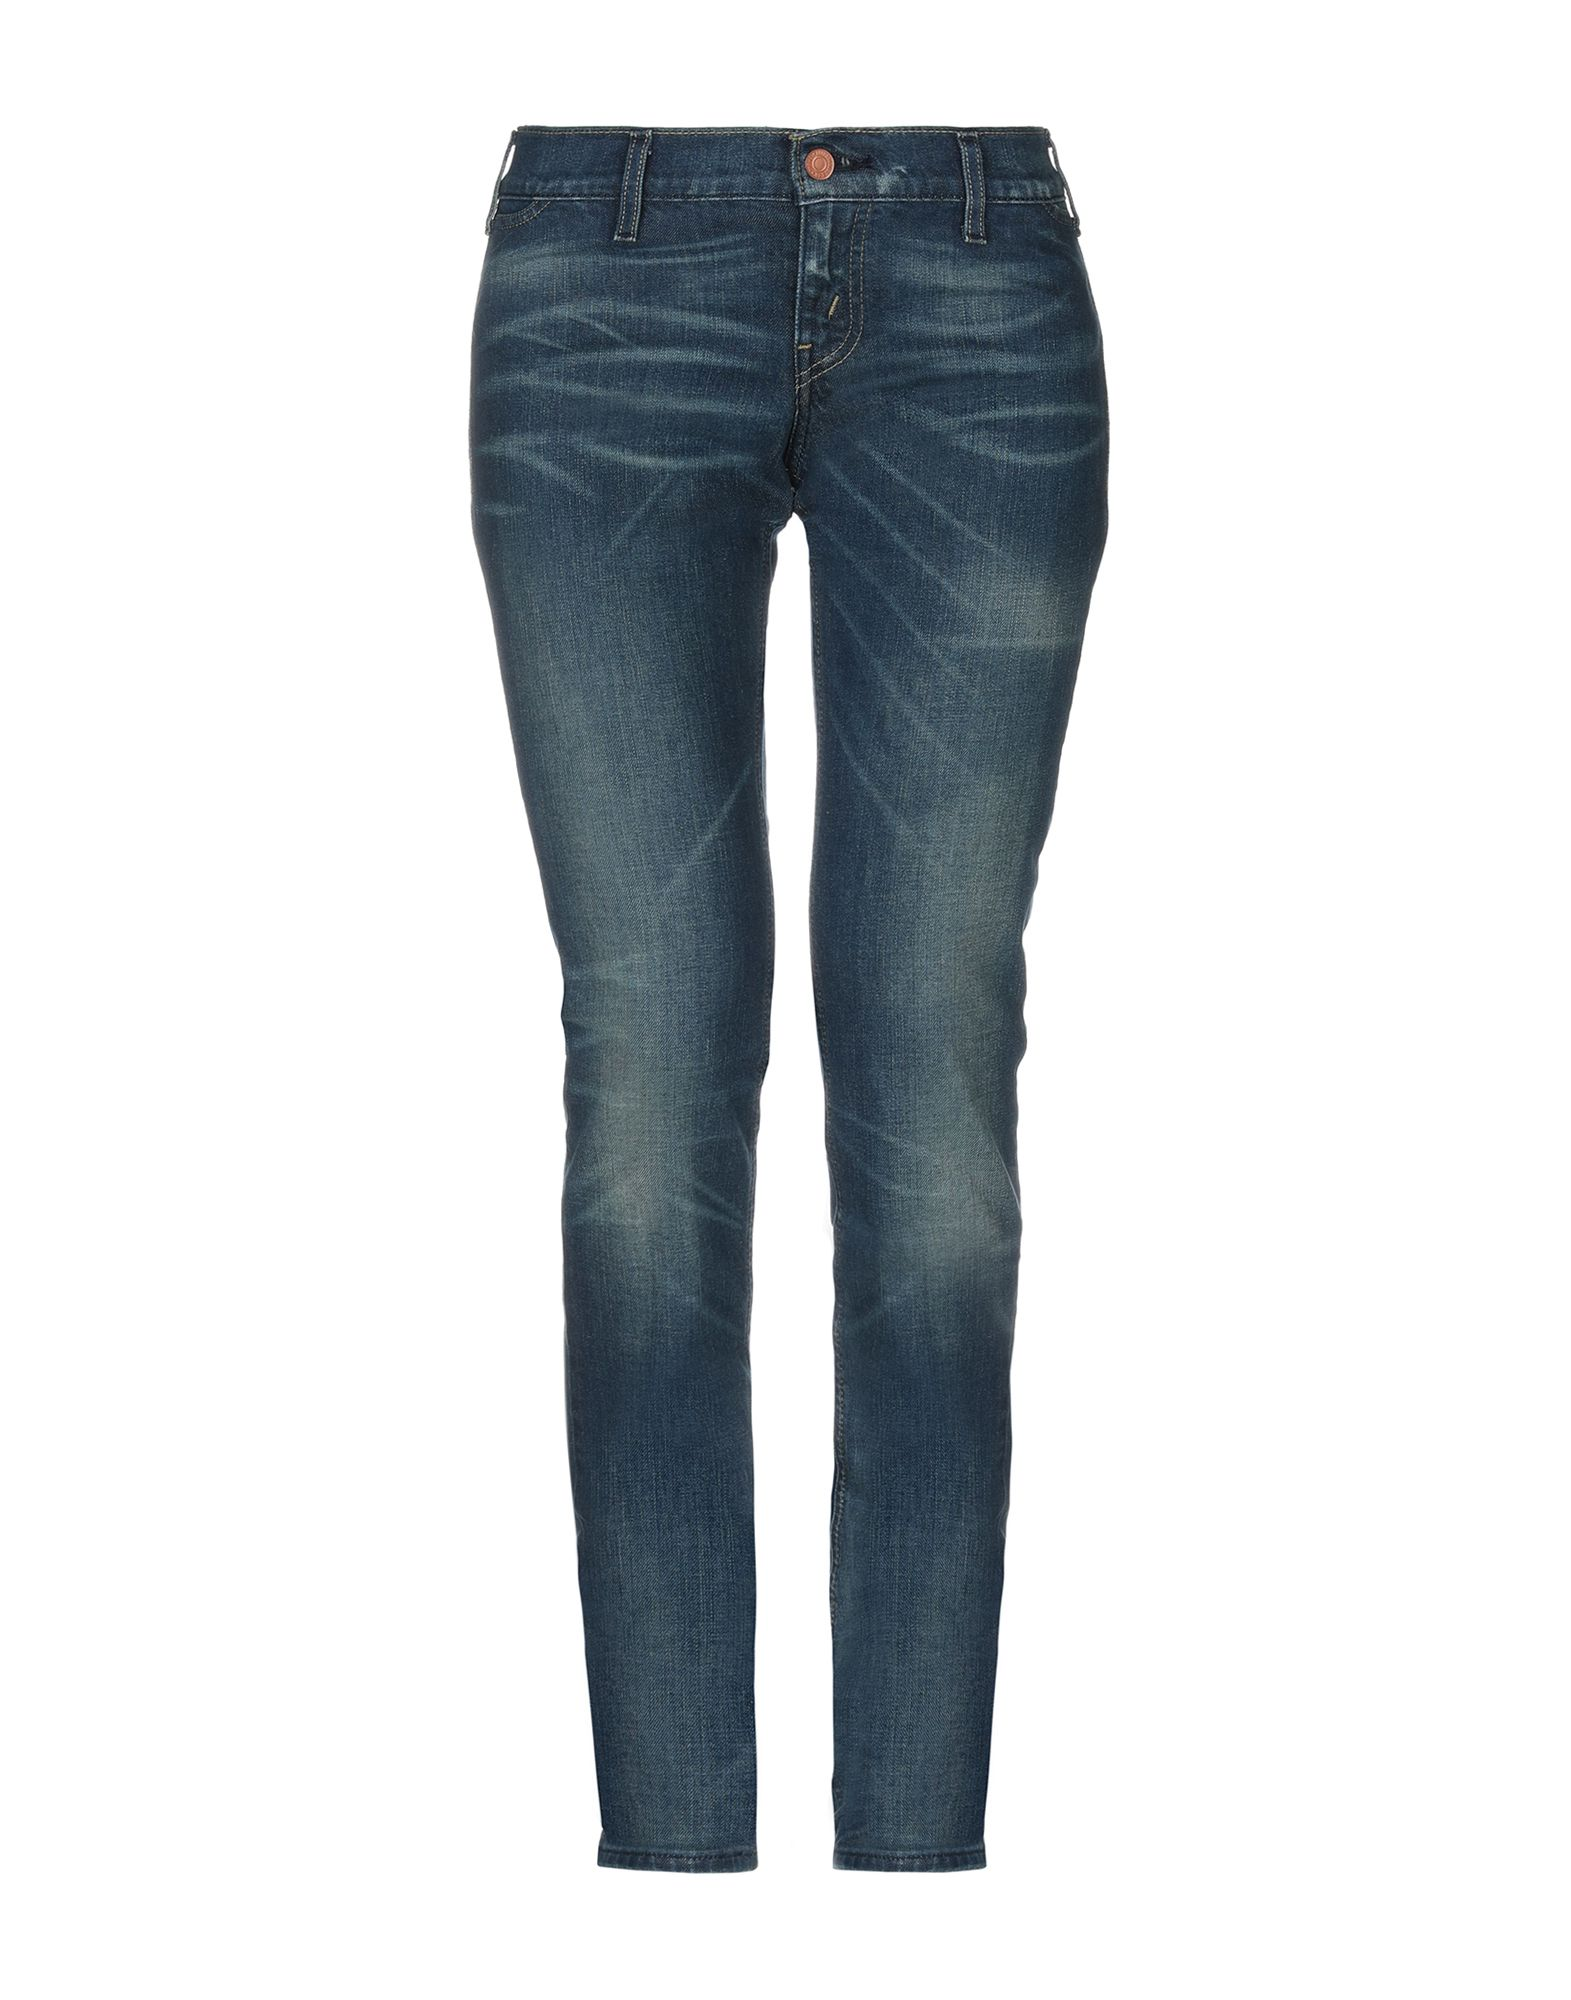 LEVI'S RED TAB Джинсовые брюки button design mid waist skinny jeans